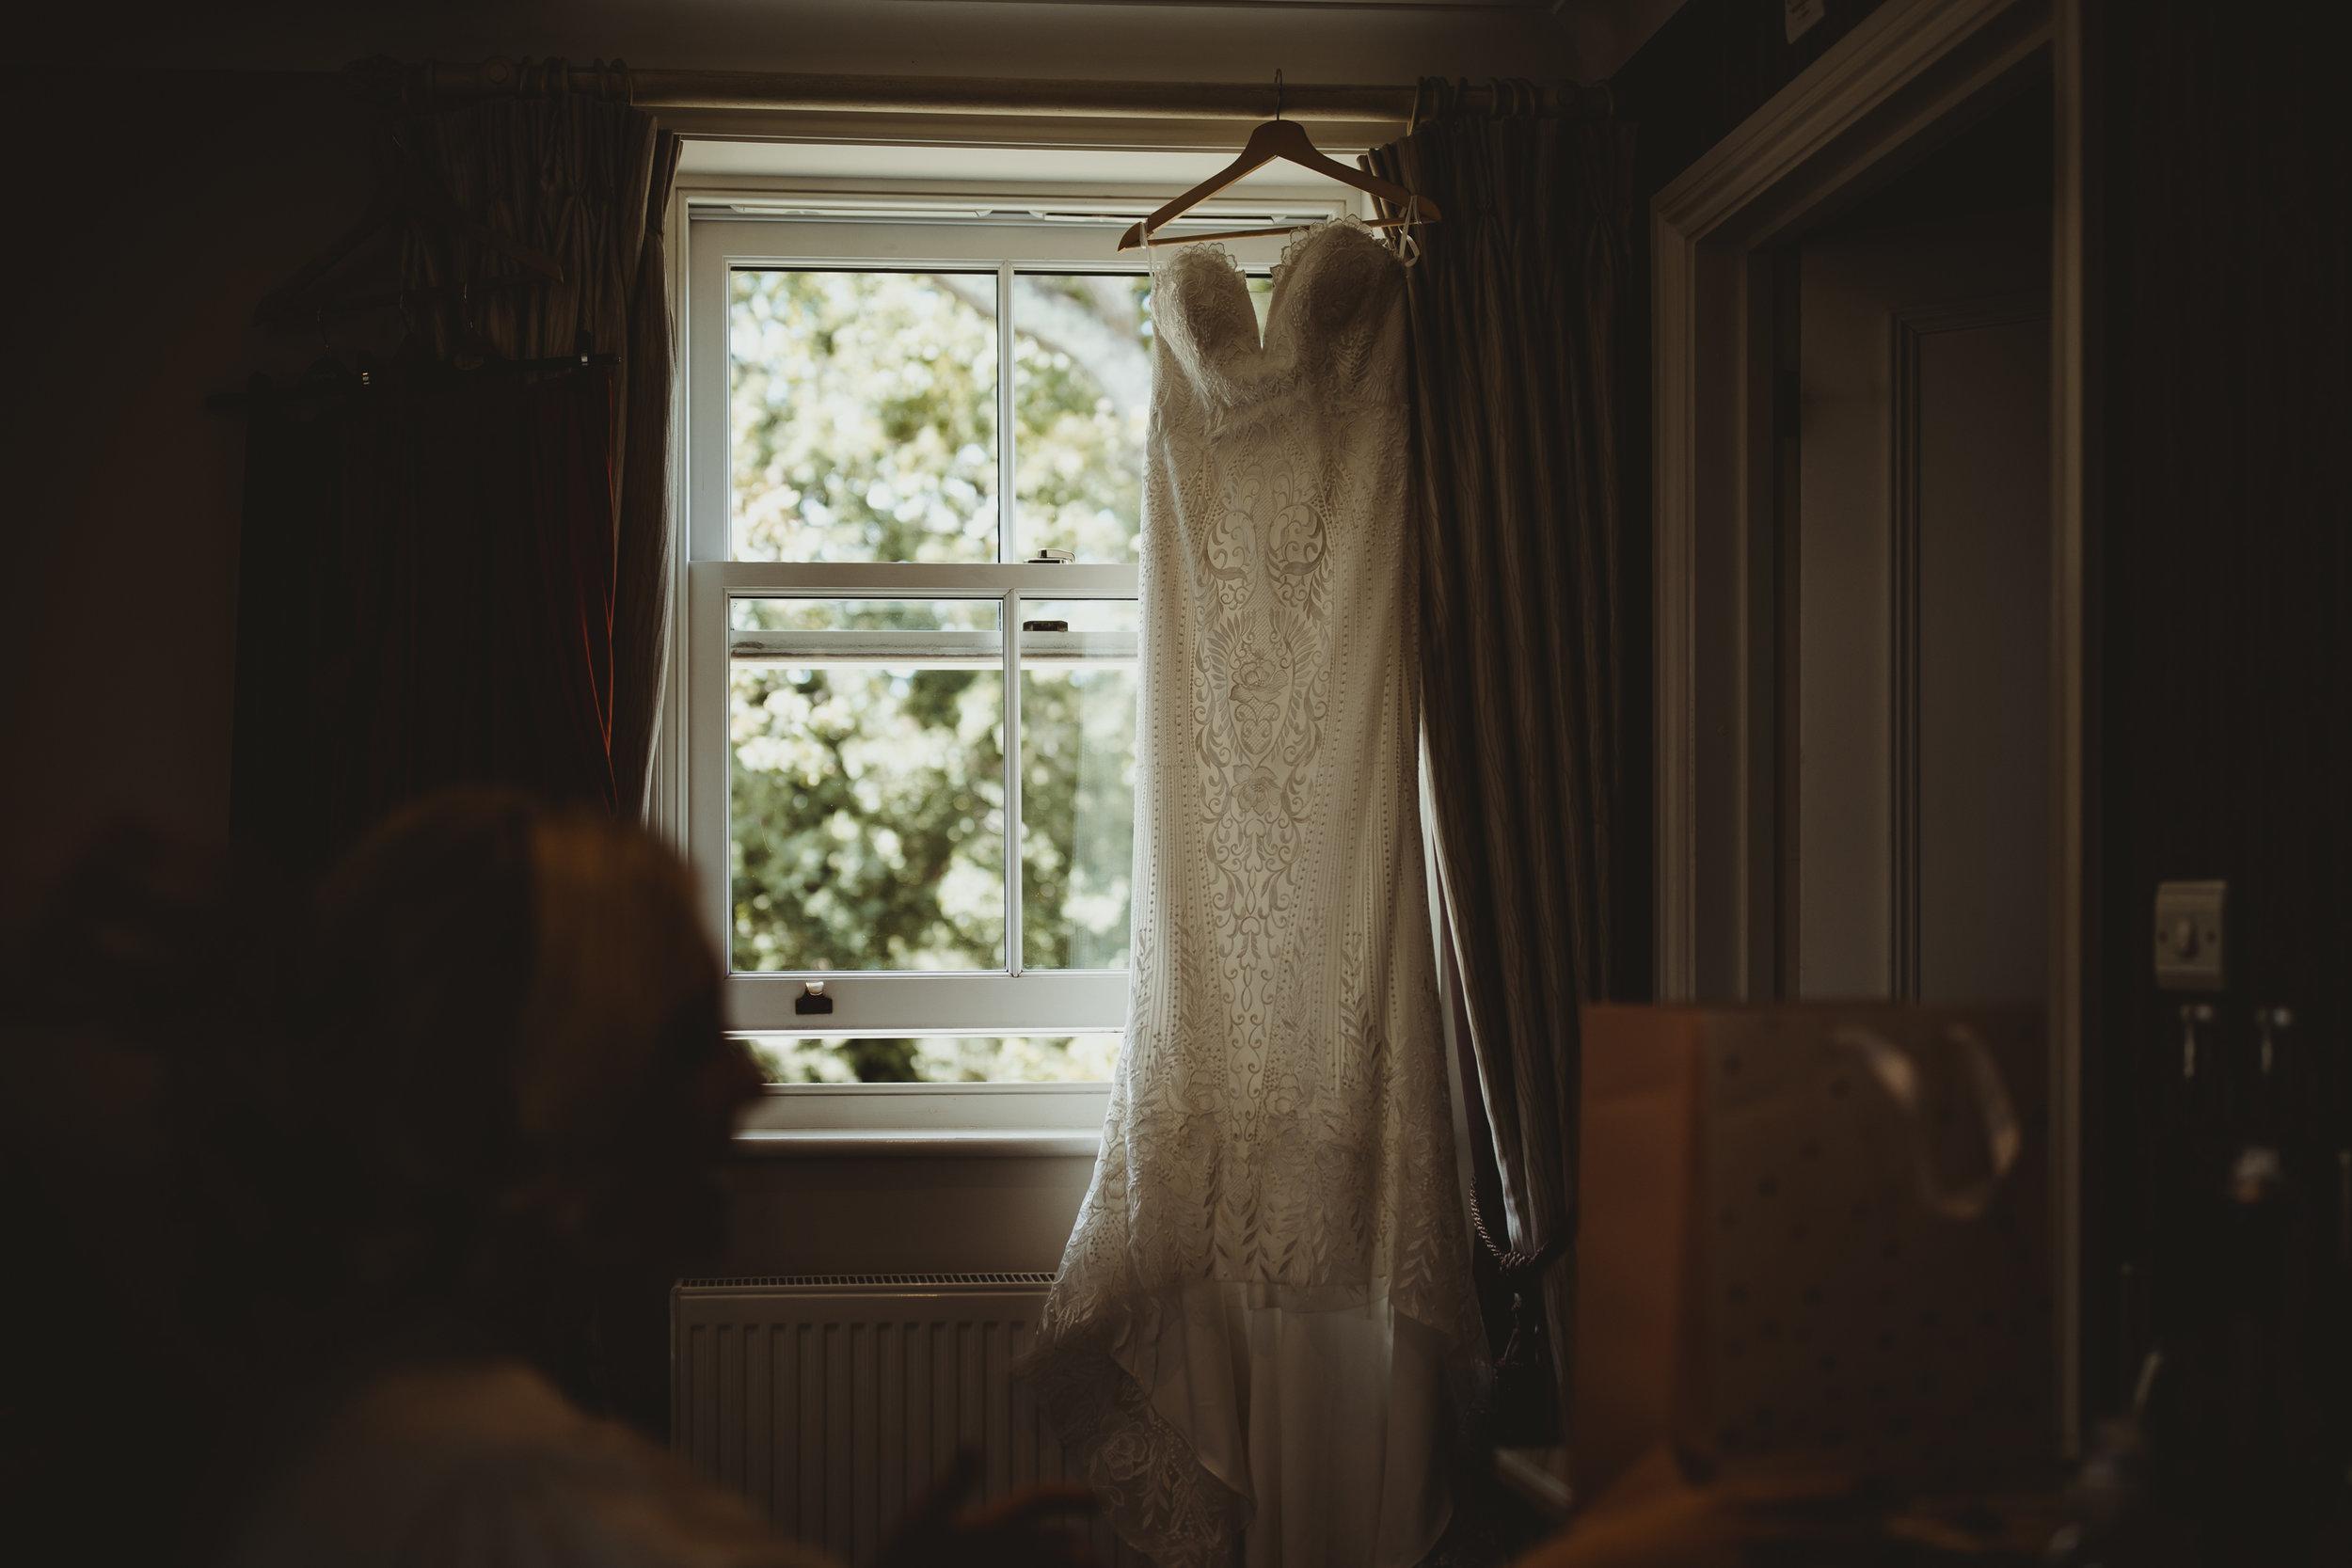 A&E_HampshireWedding_Photographer_Yorkshire_London-2.JPG